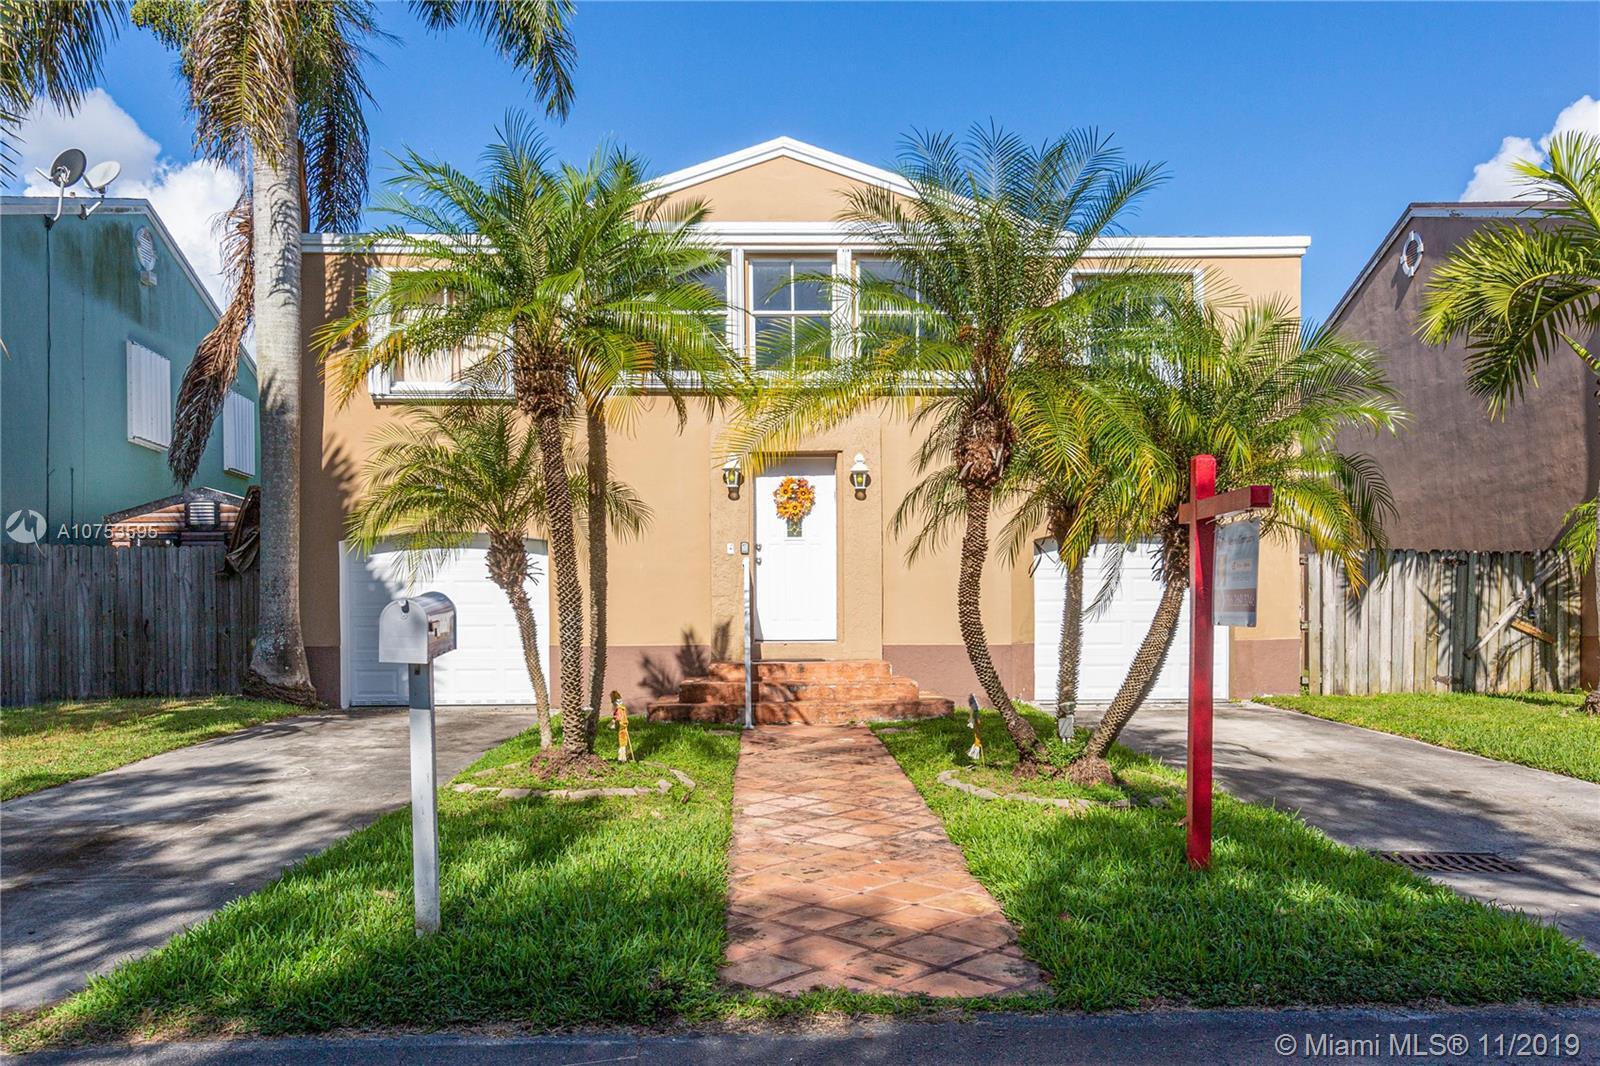 27040 SW 120th Ave Rd, Homestead, FL 33032 - Homestead, FL real estate listing